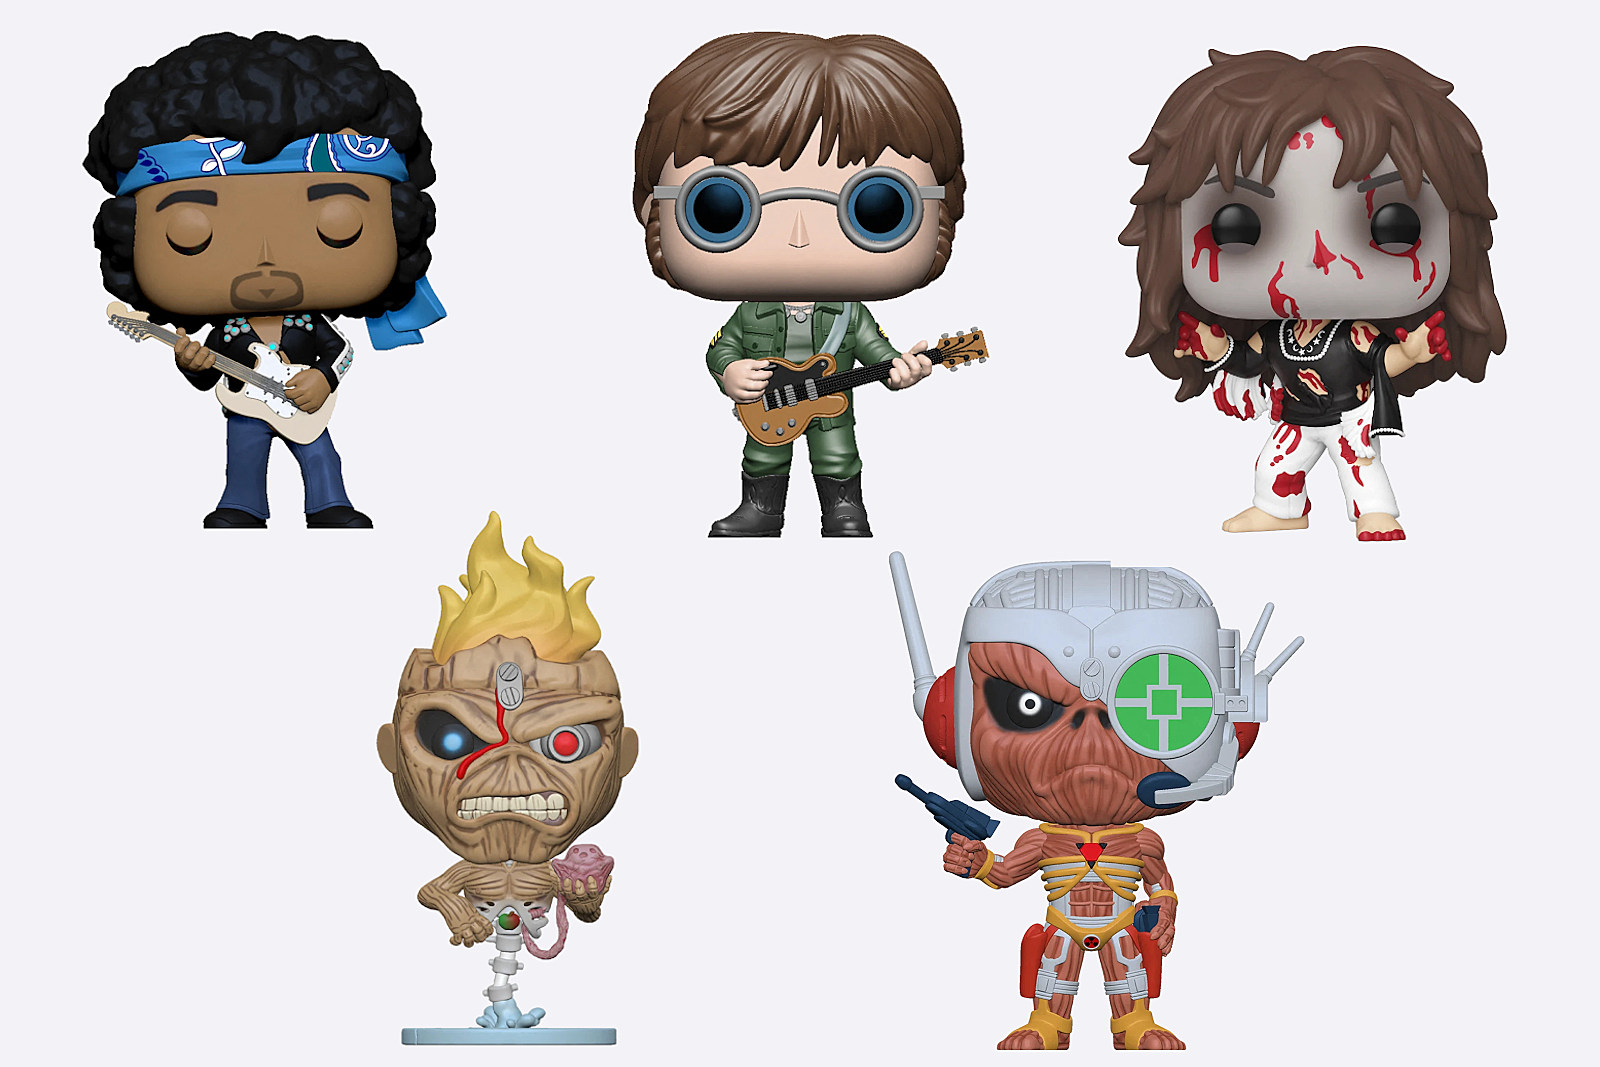 John Lennon, Ozzy Osbourne, Iron Maiden Among New Funko Figures